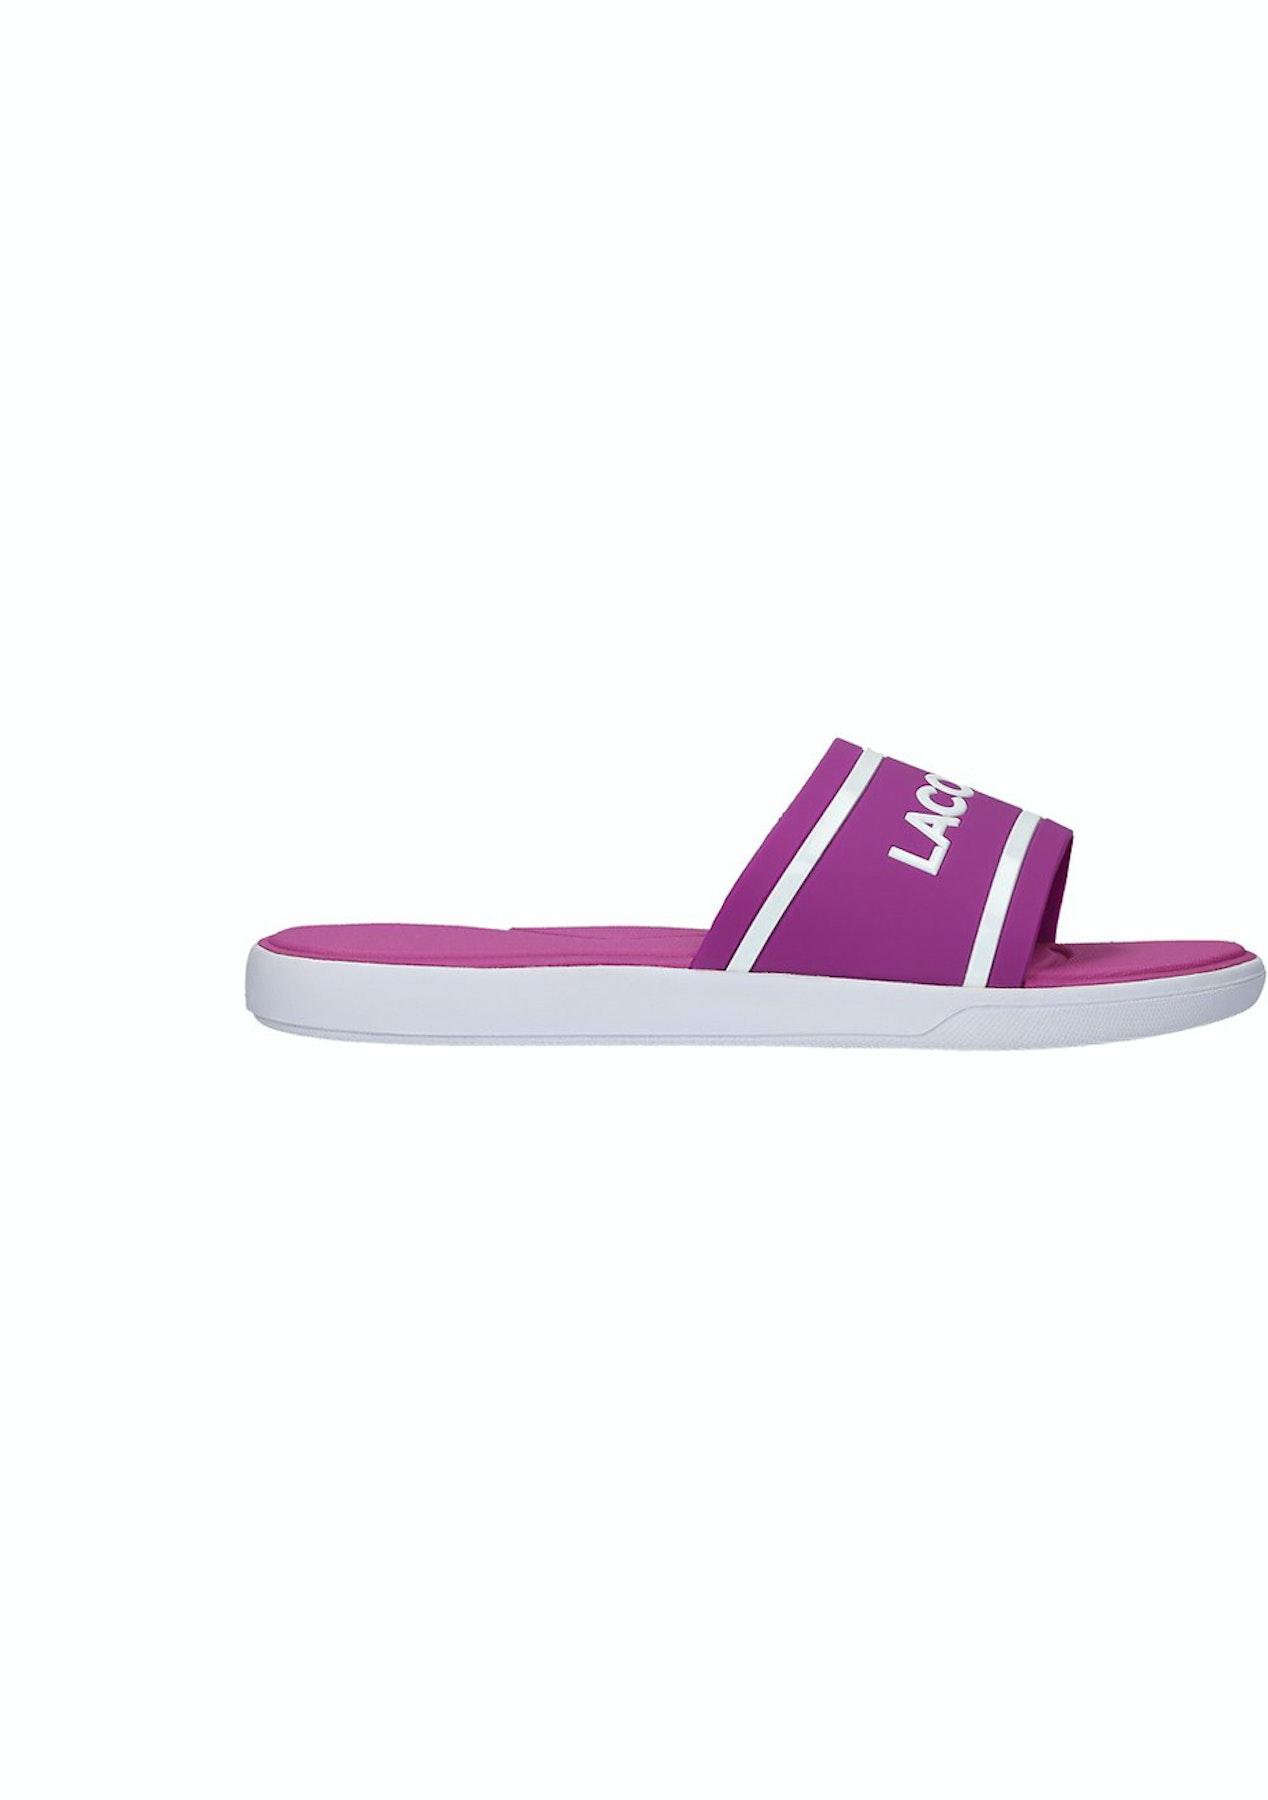 cd2c6ebac44e Lacoste - Womens L.30 Slide - Pink White - Big Brand Shoe Clearance - Onceit